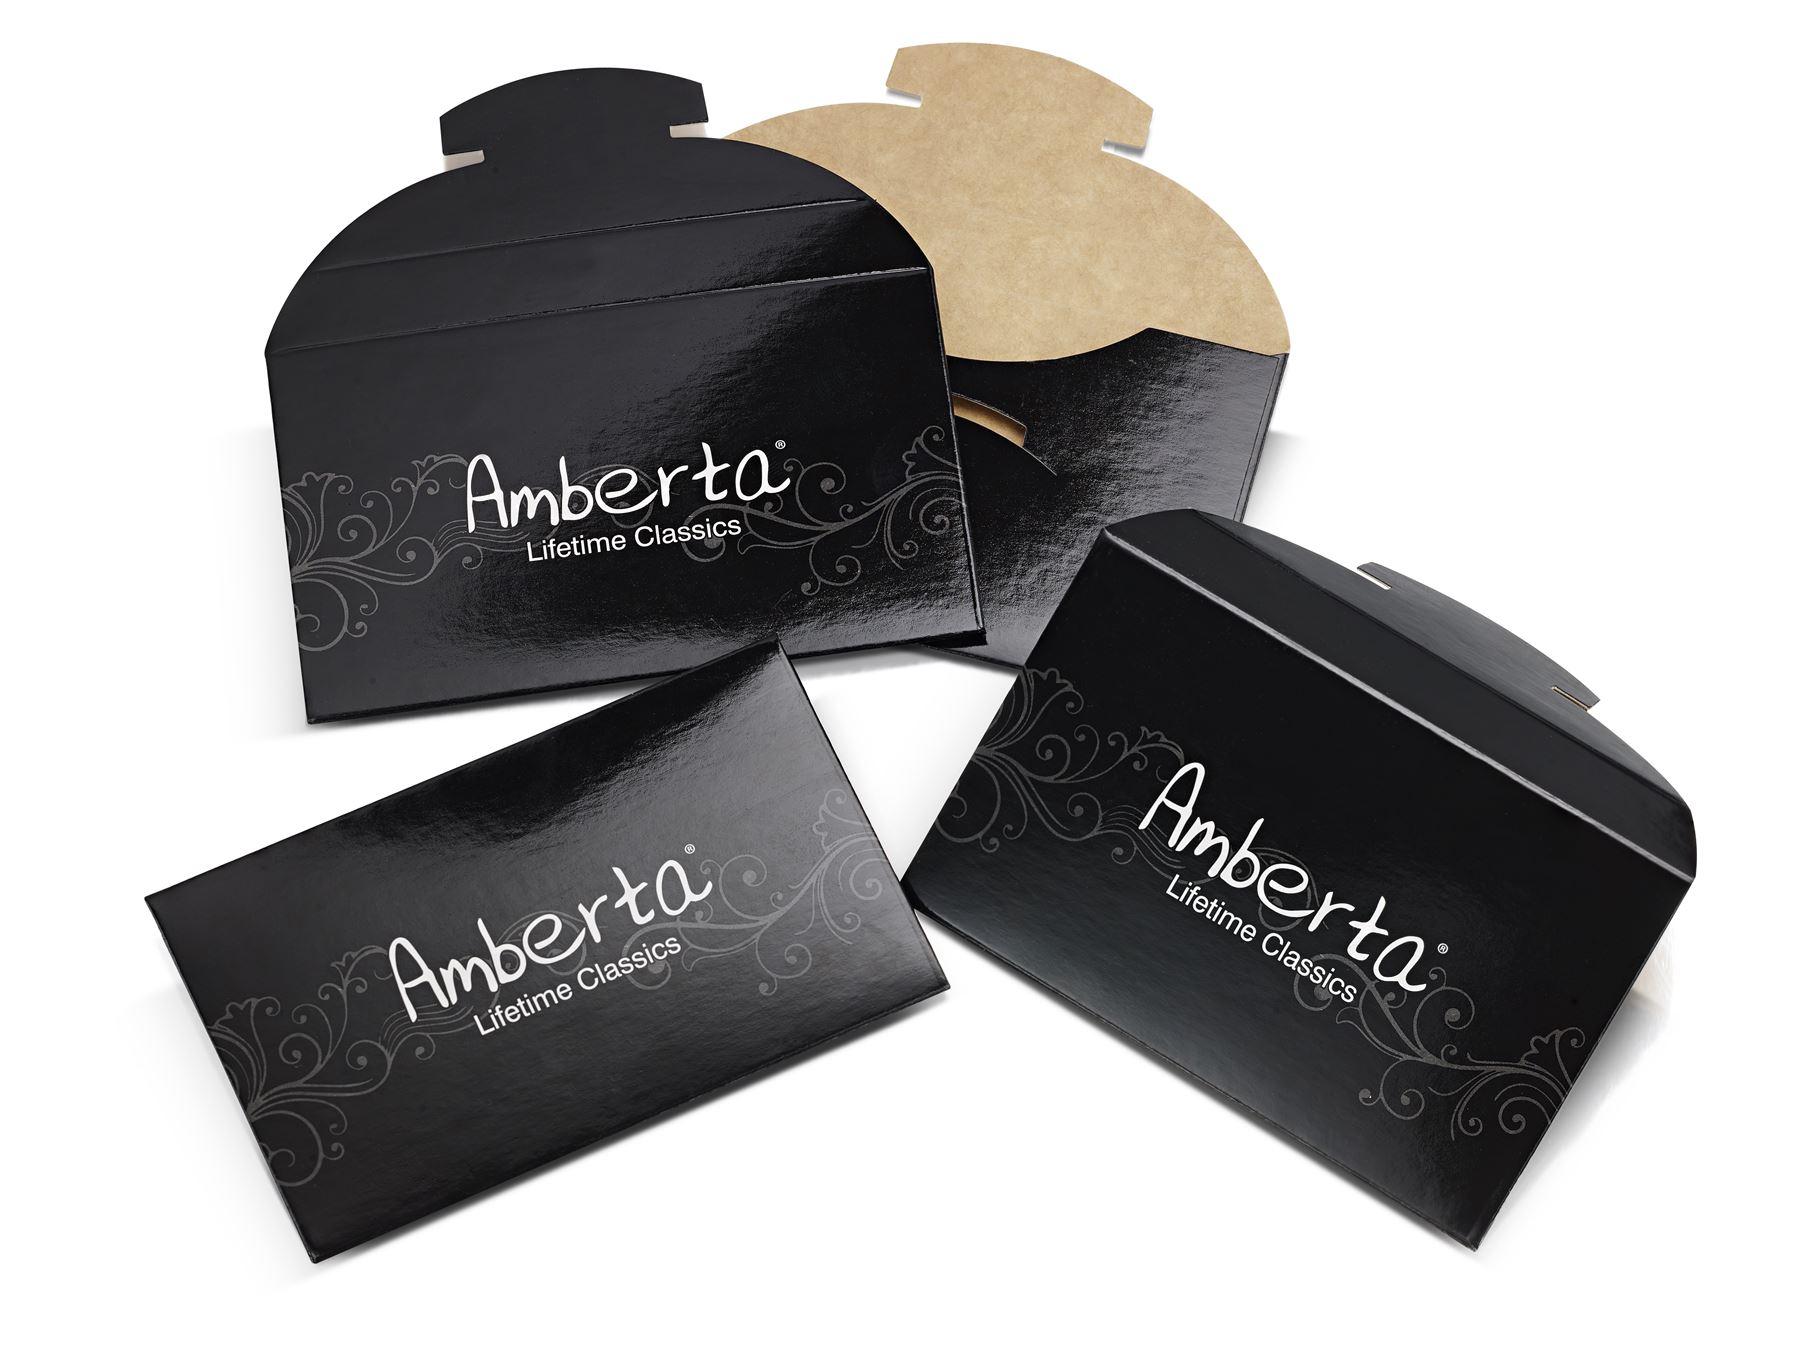 Amberta-Jewelry-925-Sterling-Silver-Adjustable-Bracelet-Italian-Bangle-for-Women thumbnail 70